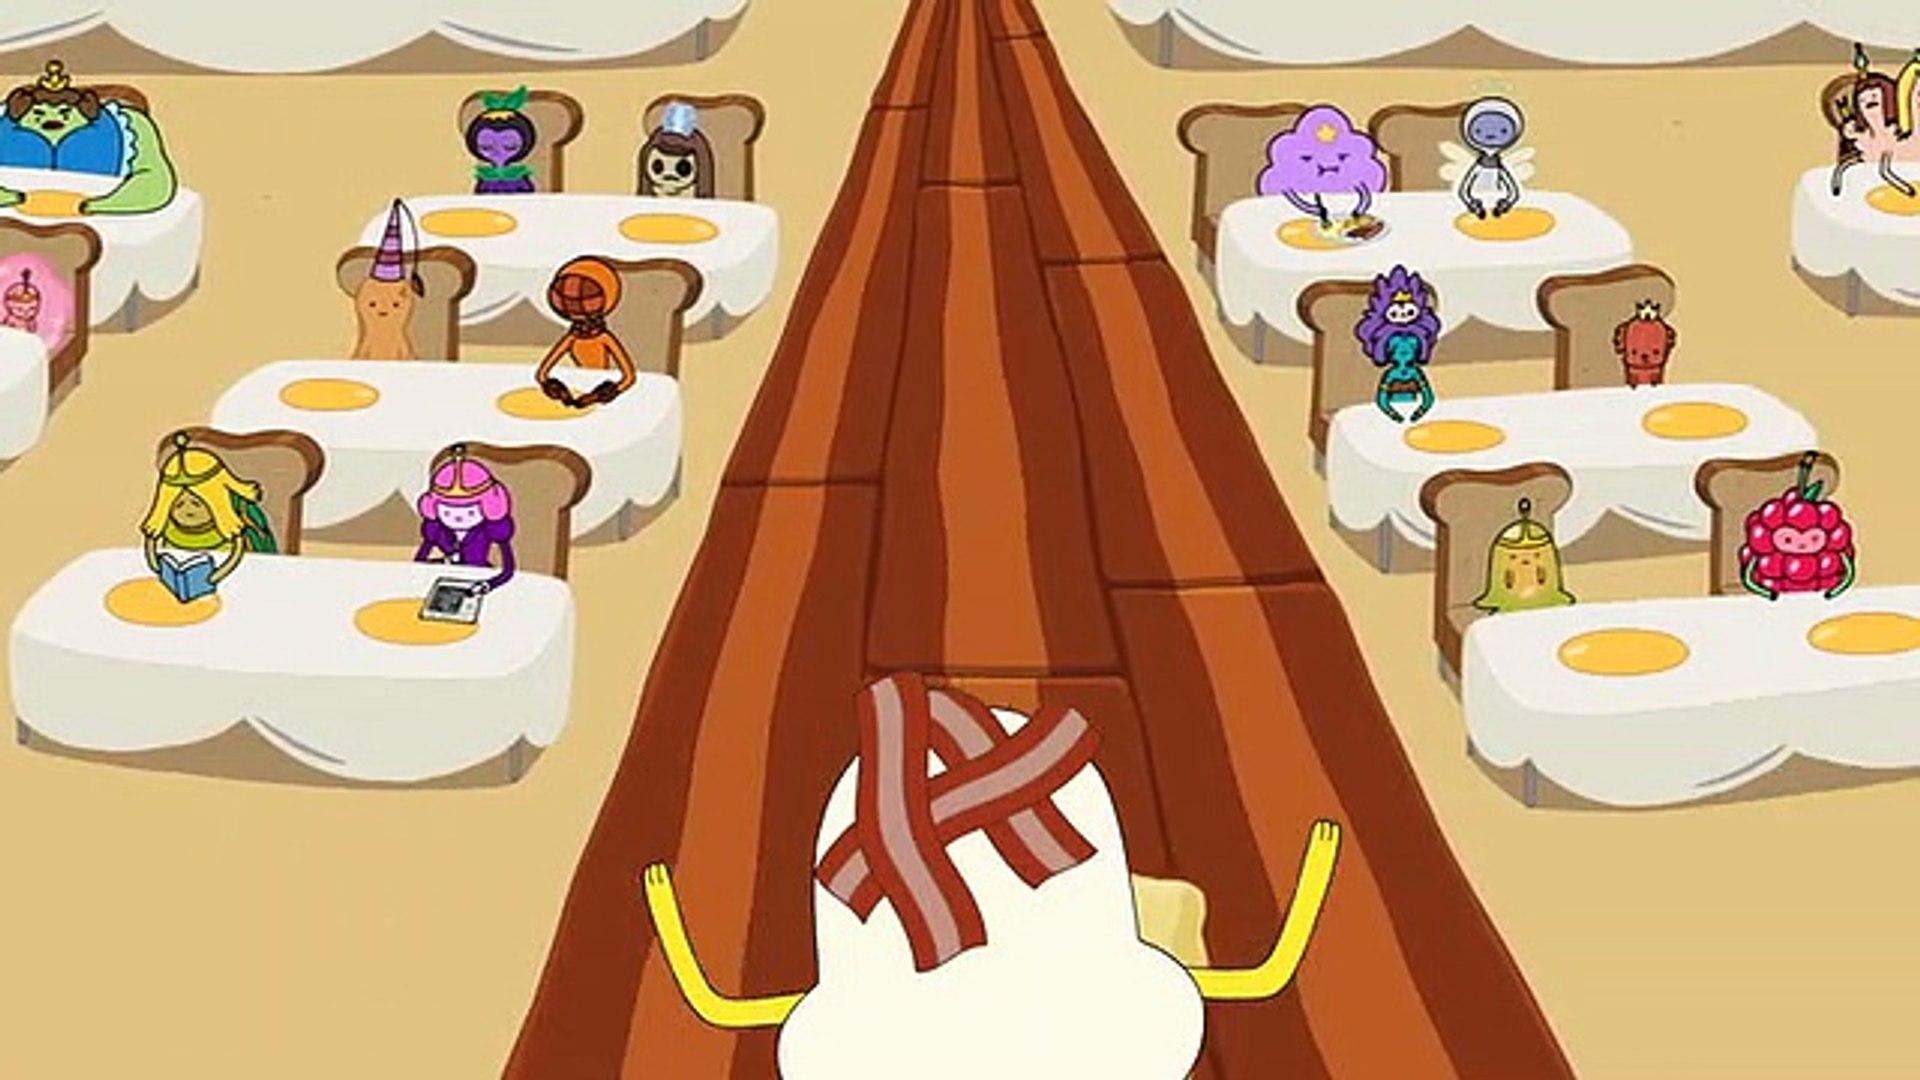 Adventure Time Princess Day adventure time s06e14 princess day